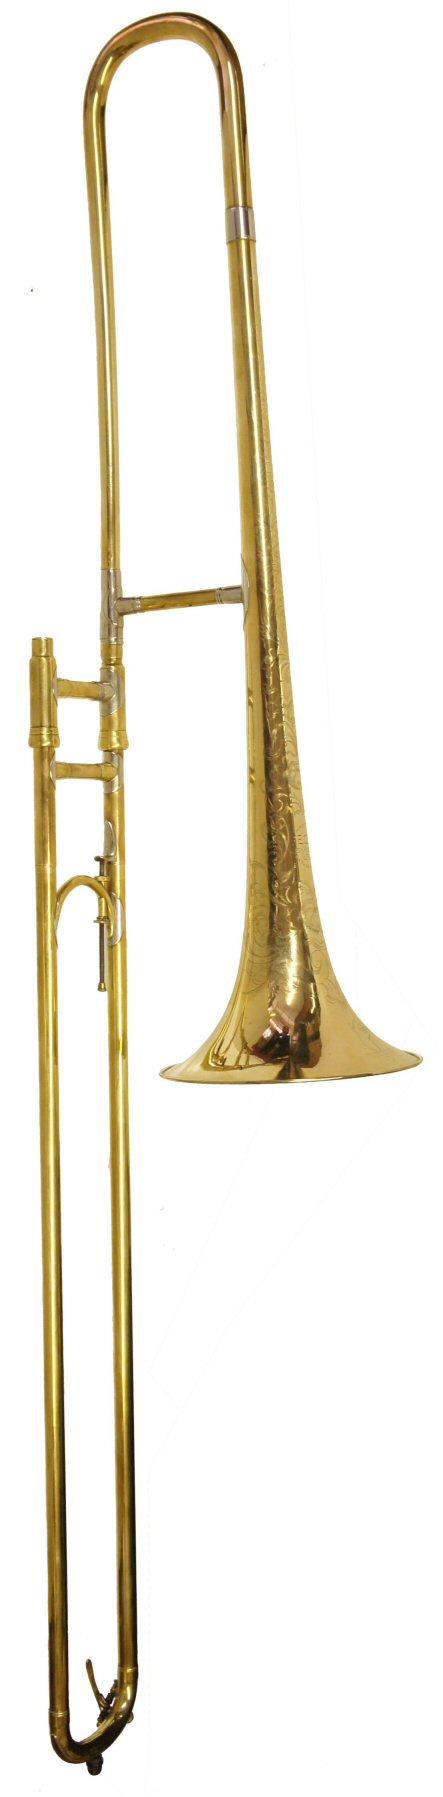 Vintage Olds Trombone C1922